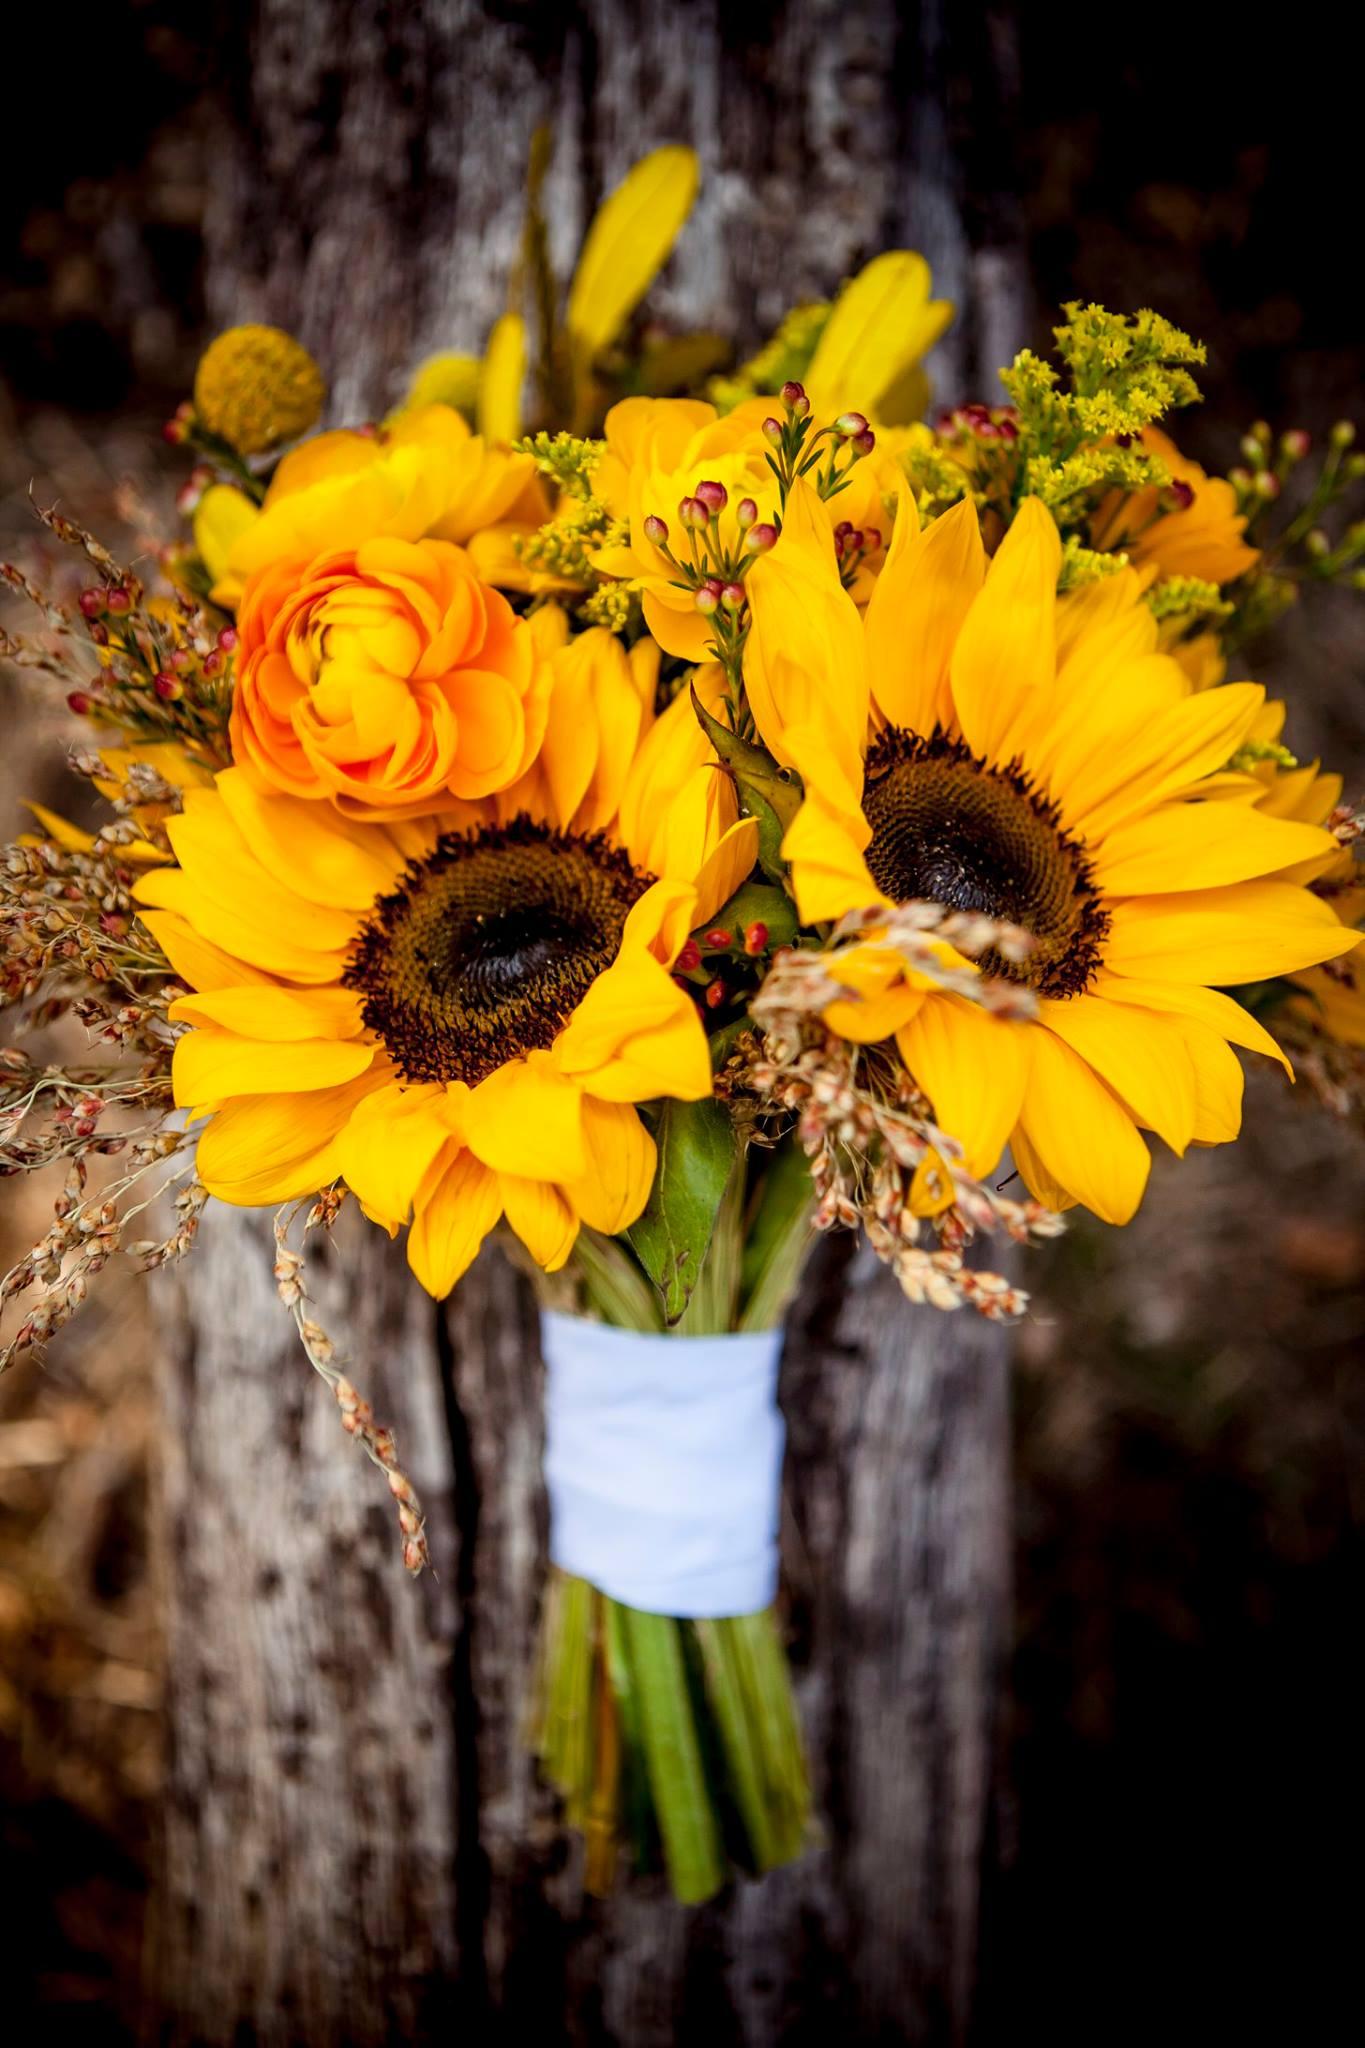 David and Kim's Outdoor Sunflower Wedding